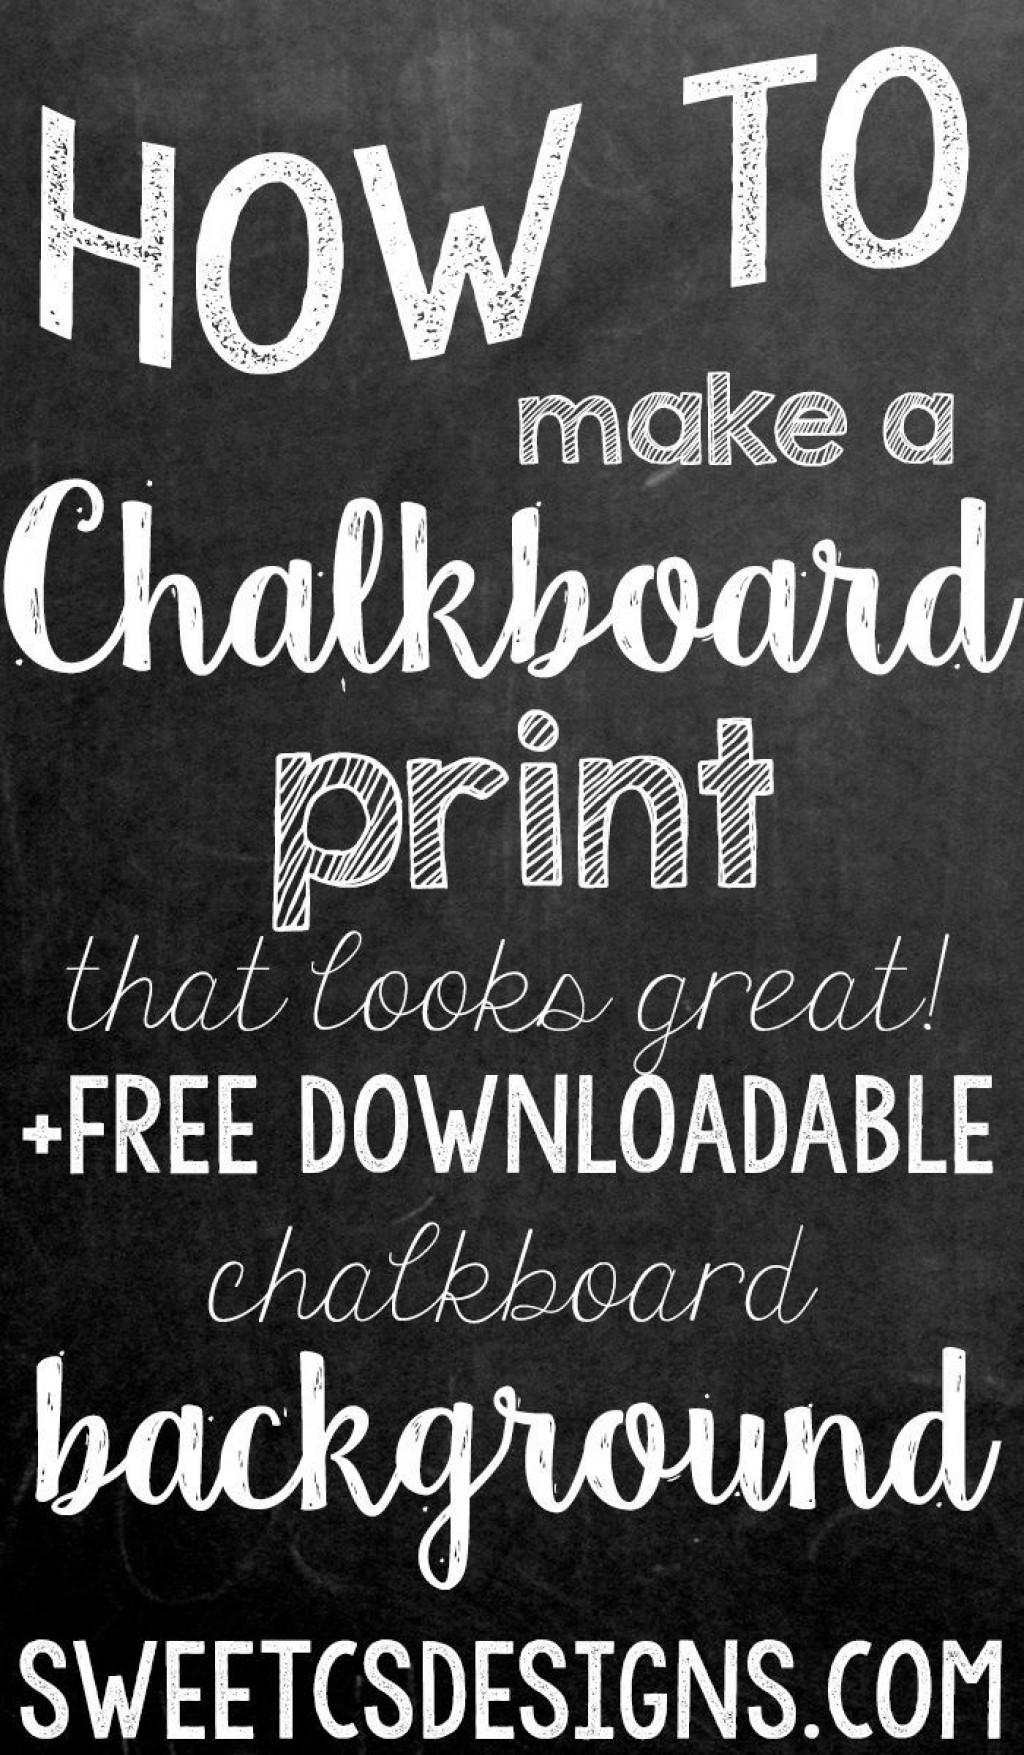 000 Beautiful Chalkboard Template Microsoft Word Example  Editable MenuLarge